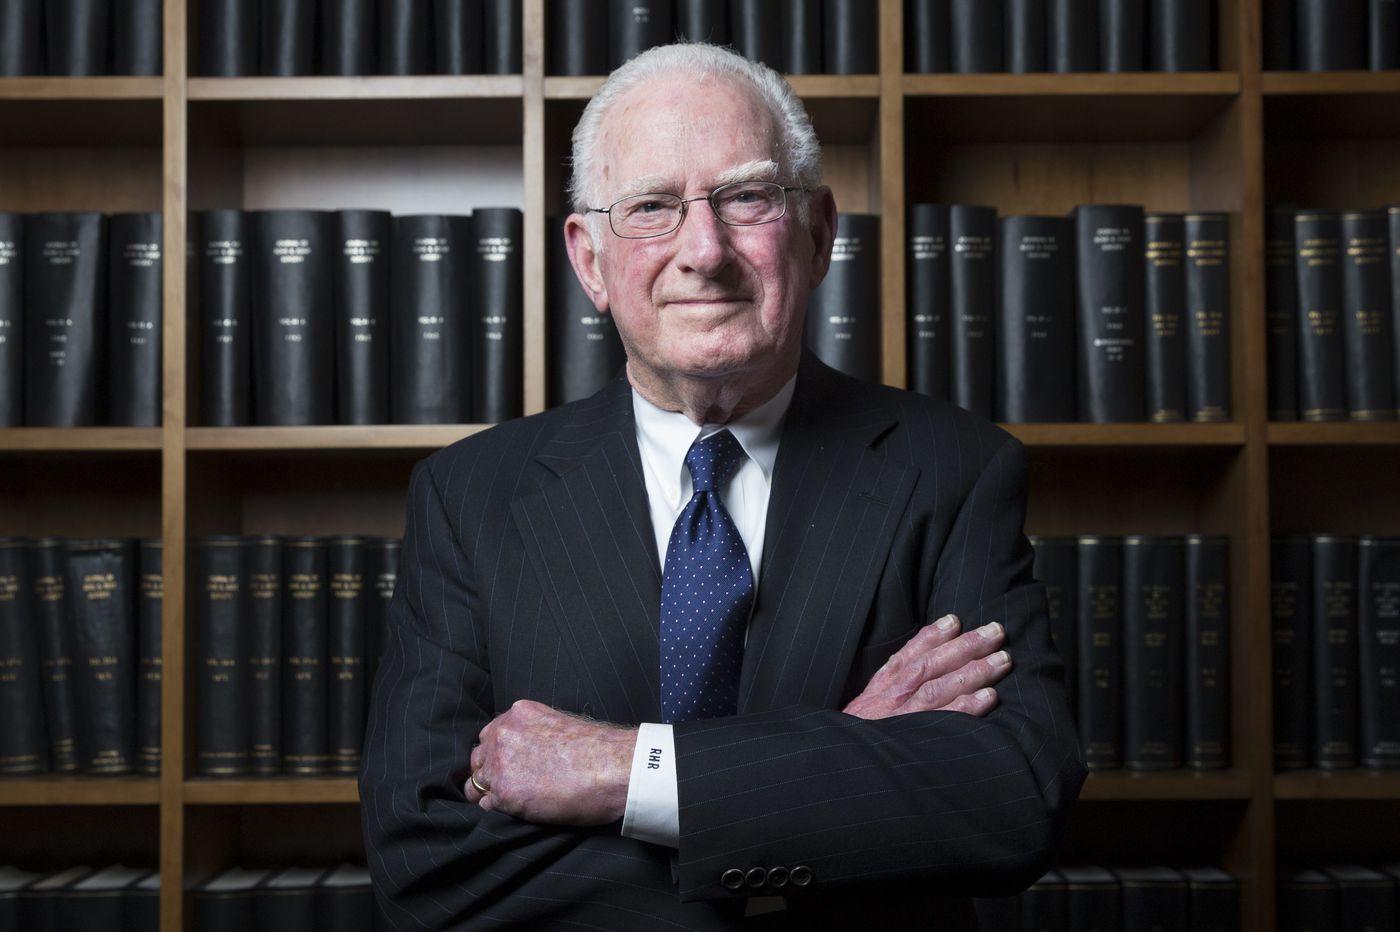 Philadelphia surgeon Richard Rothman, 81, dies; leaves legacy of medical empire